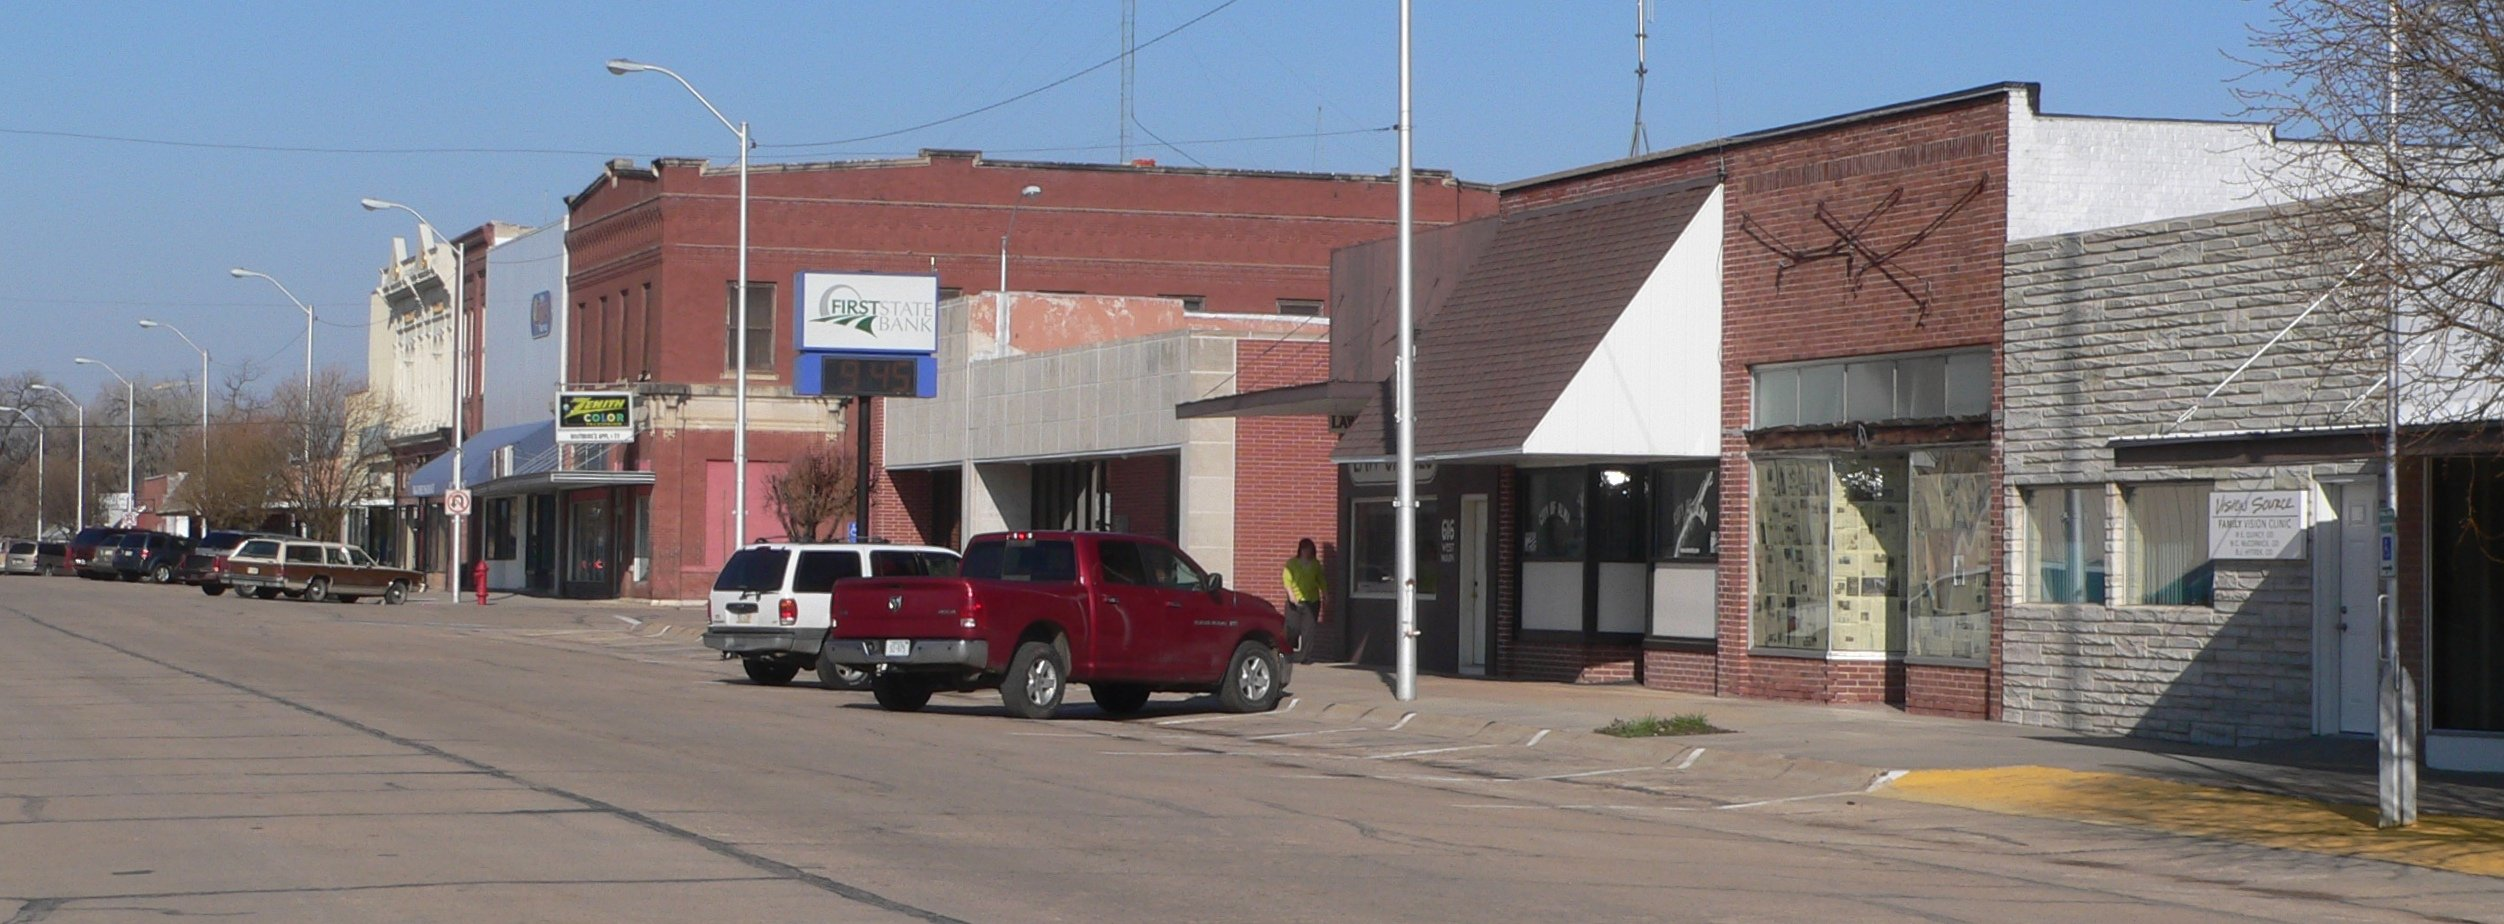 Alma funeral homes funeral services flowers in nebraska for Nebraska home builders